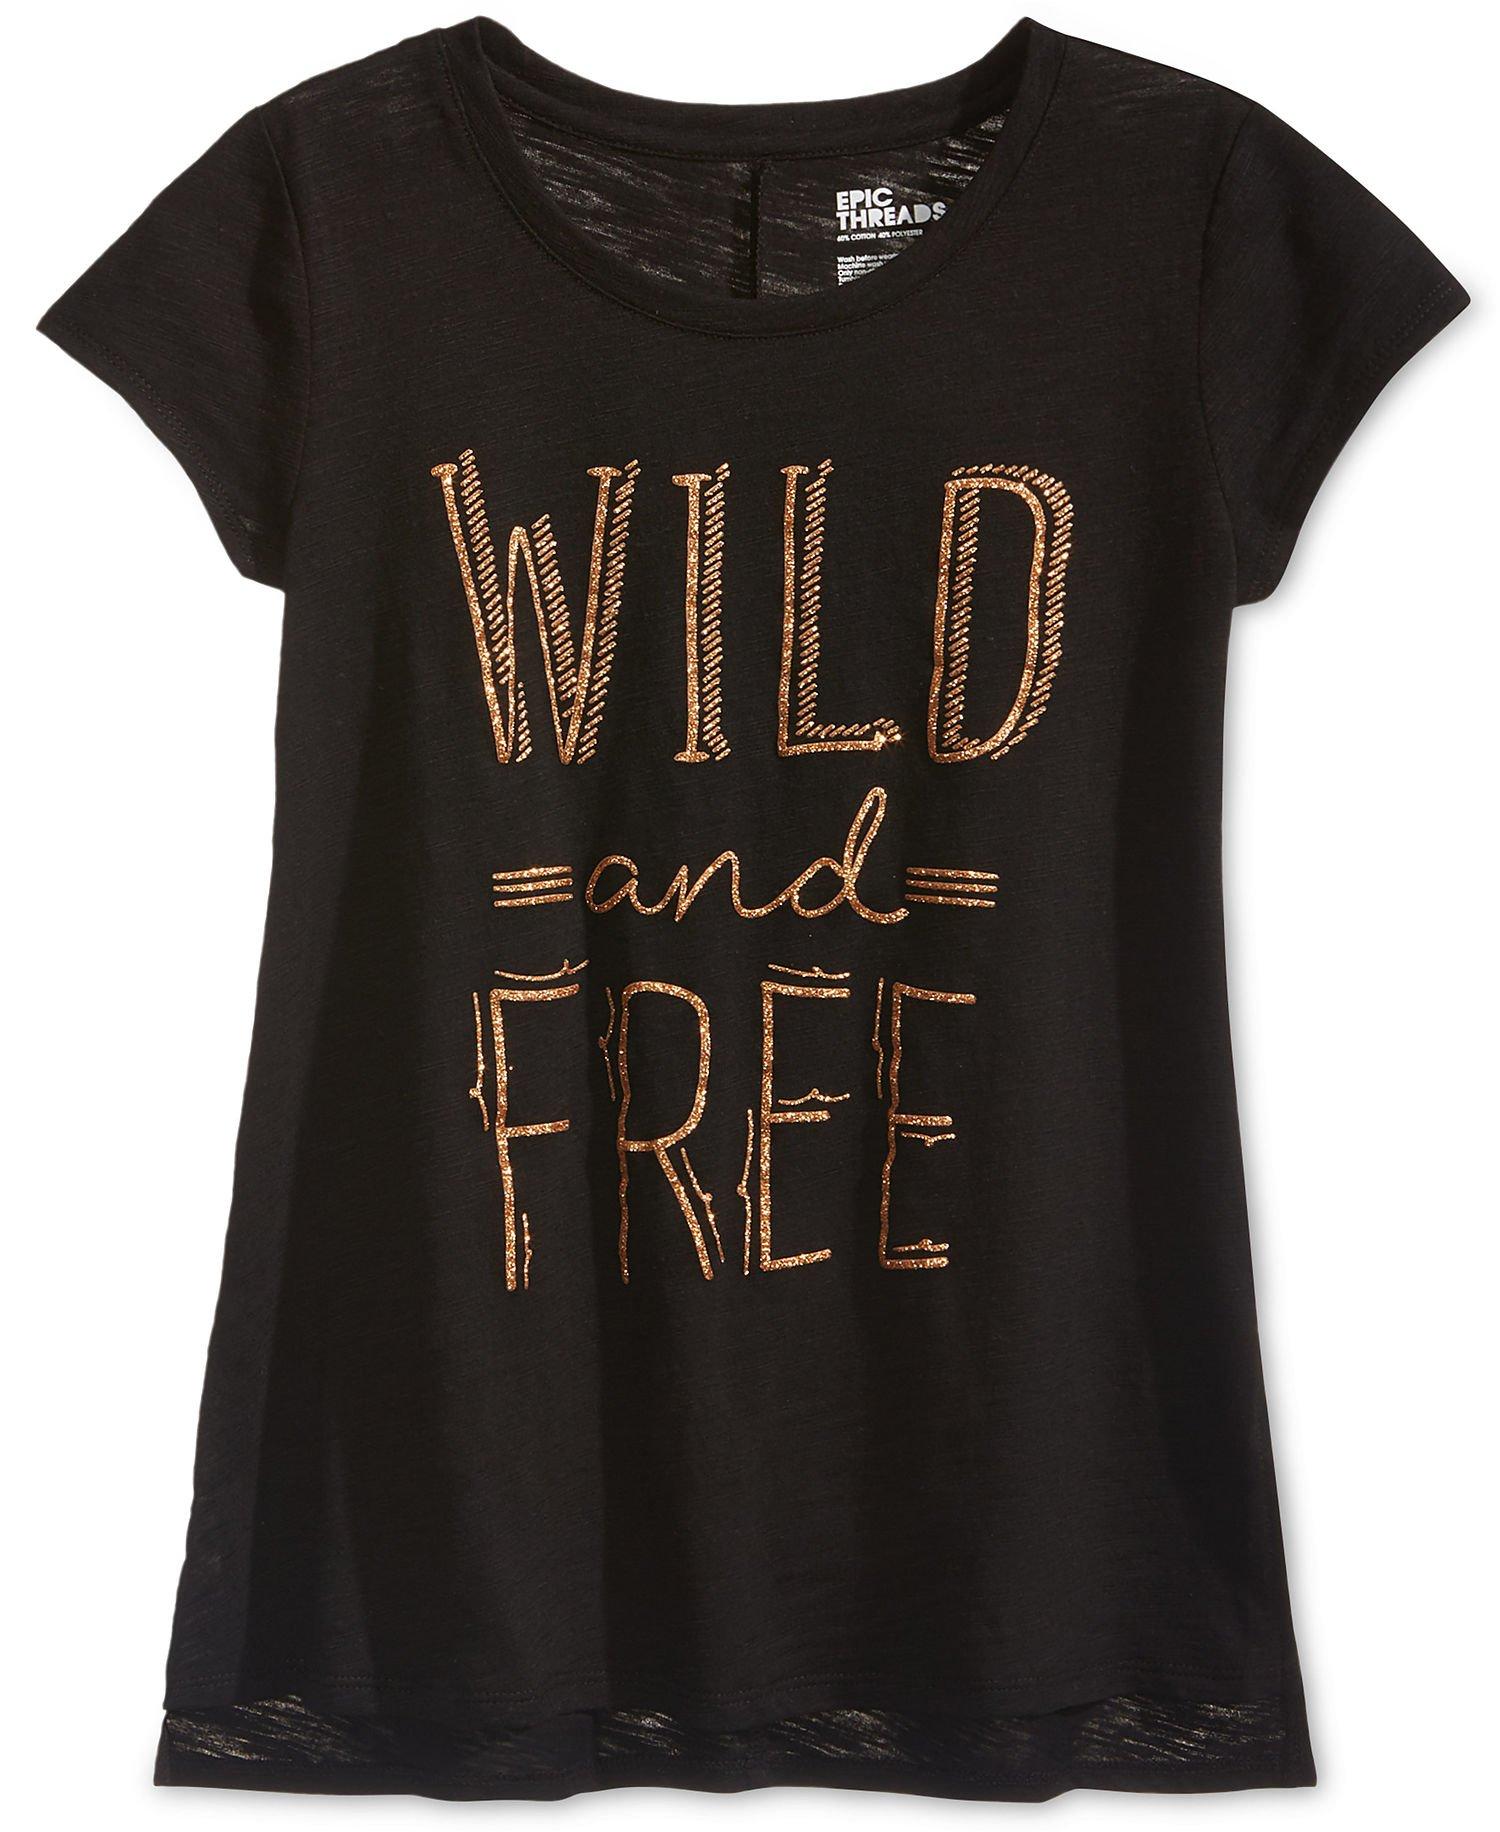 Epic Threads Girls T-Shirt Tee Shirt (XLarge, Black)